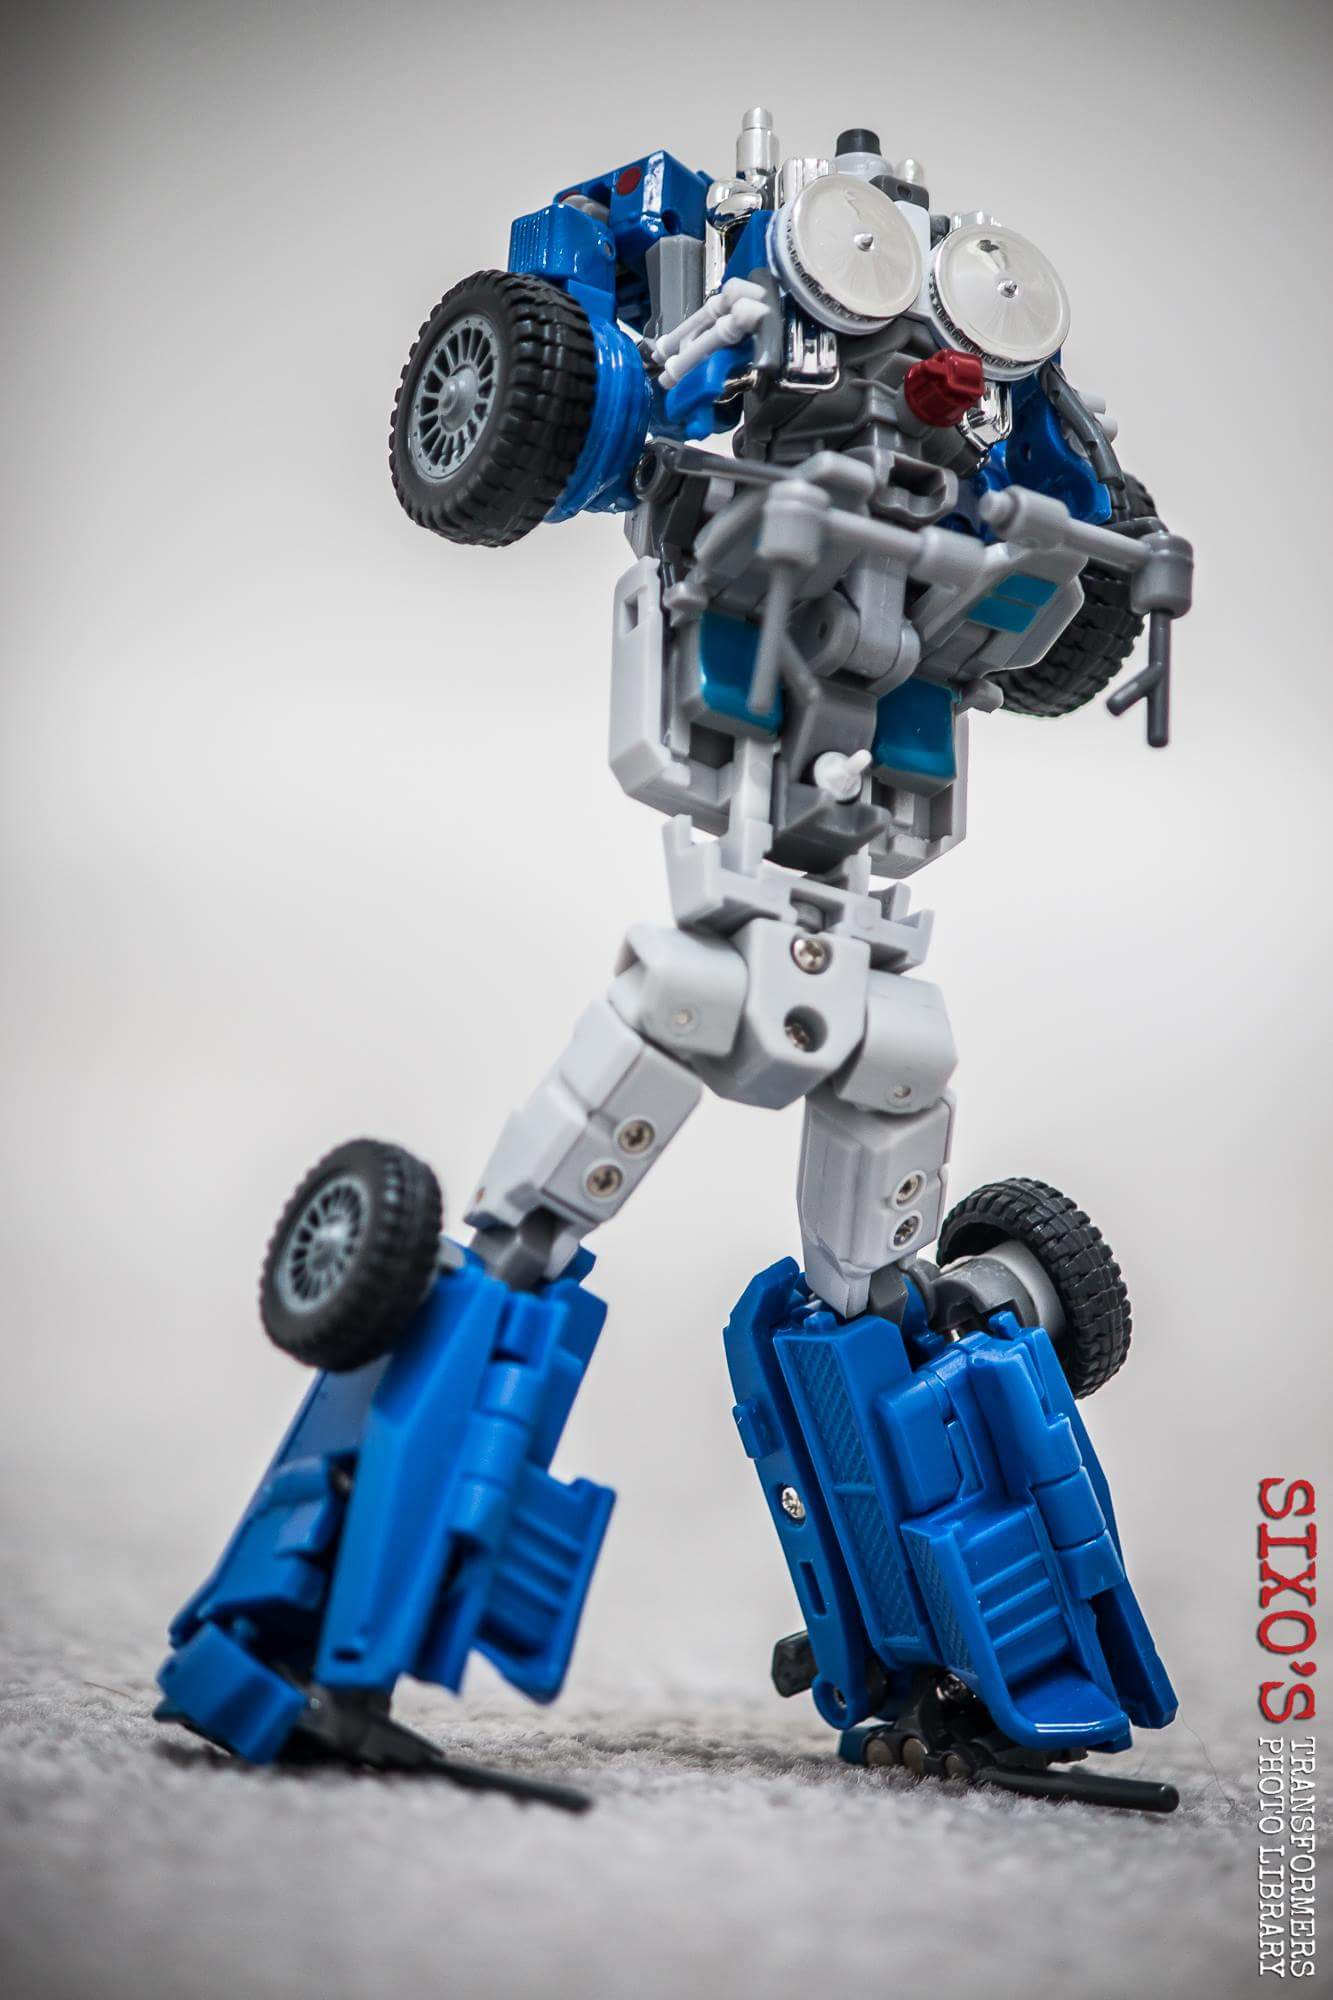 [X-Transbots] Produit Tiers - Minibots MP - Gamme MM - Page 6 C9RHibsV